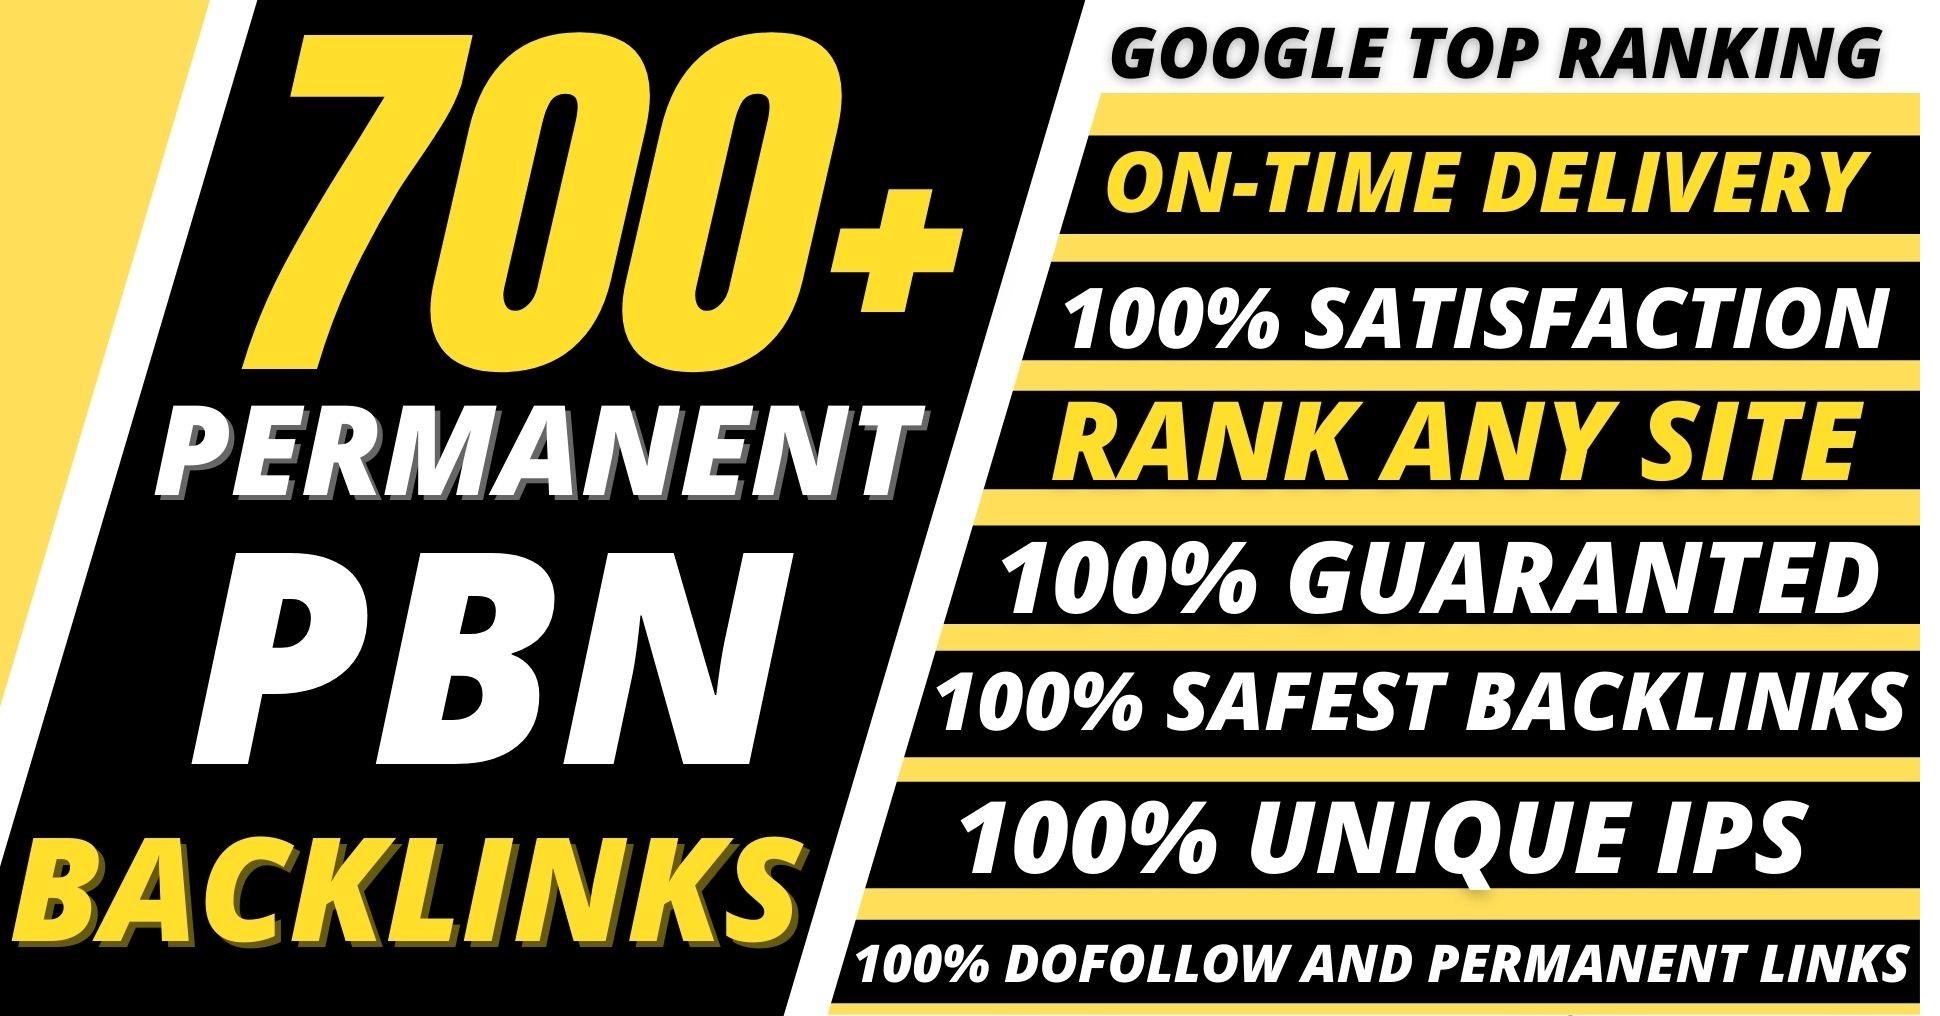 GET - POWERFULL - 700 - DA/DR 40+ PBN Links Gambling/Poker/Casino/Gaming Permanent Backlinks